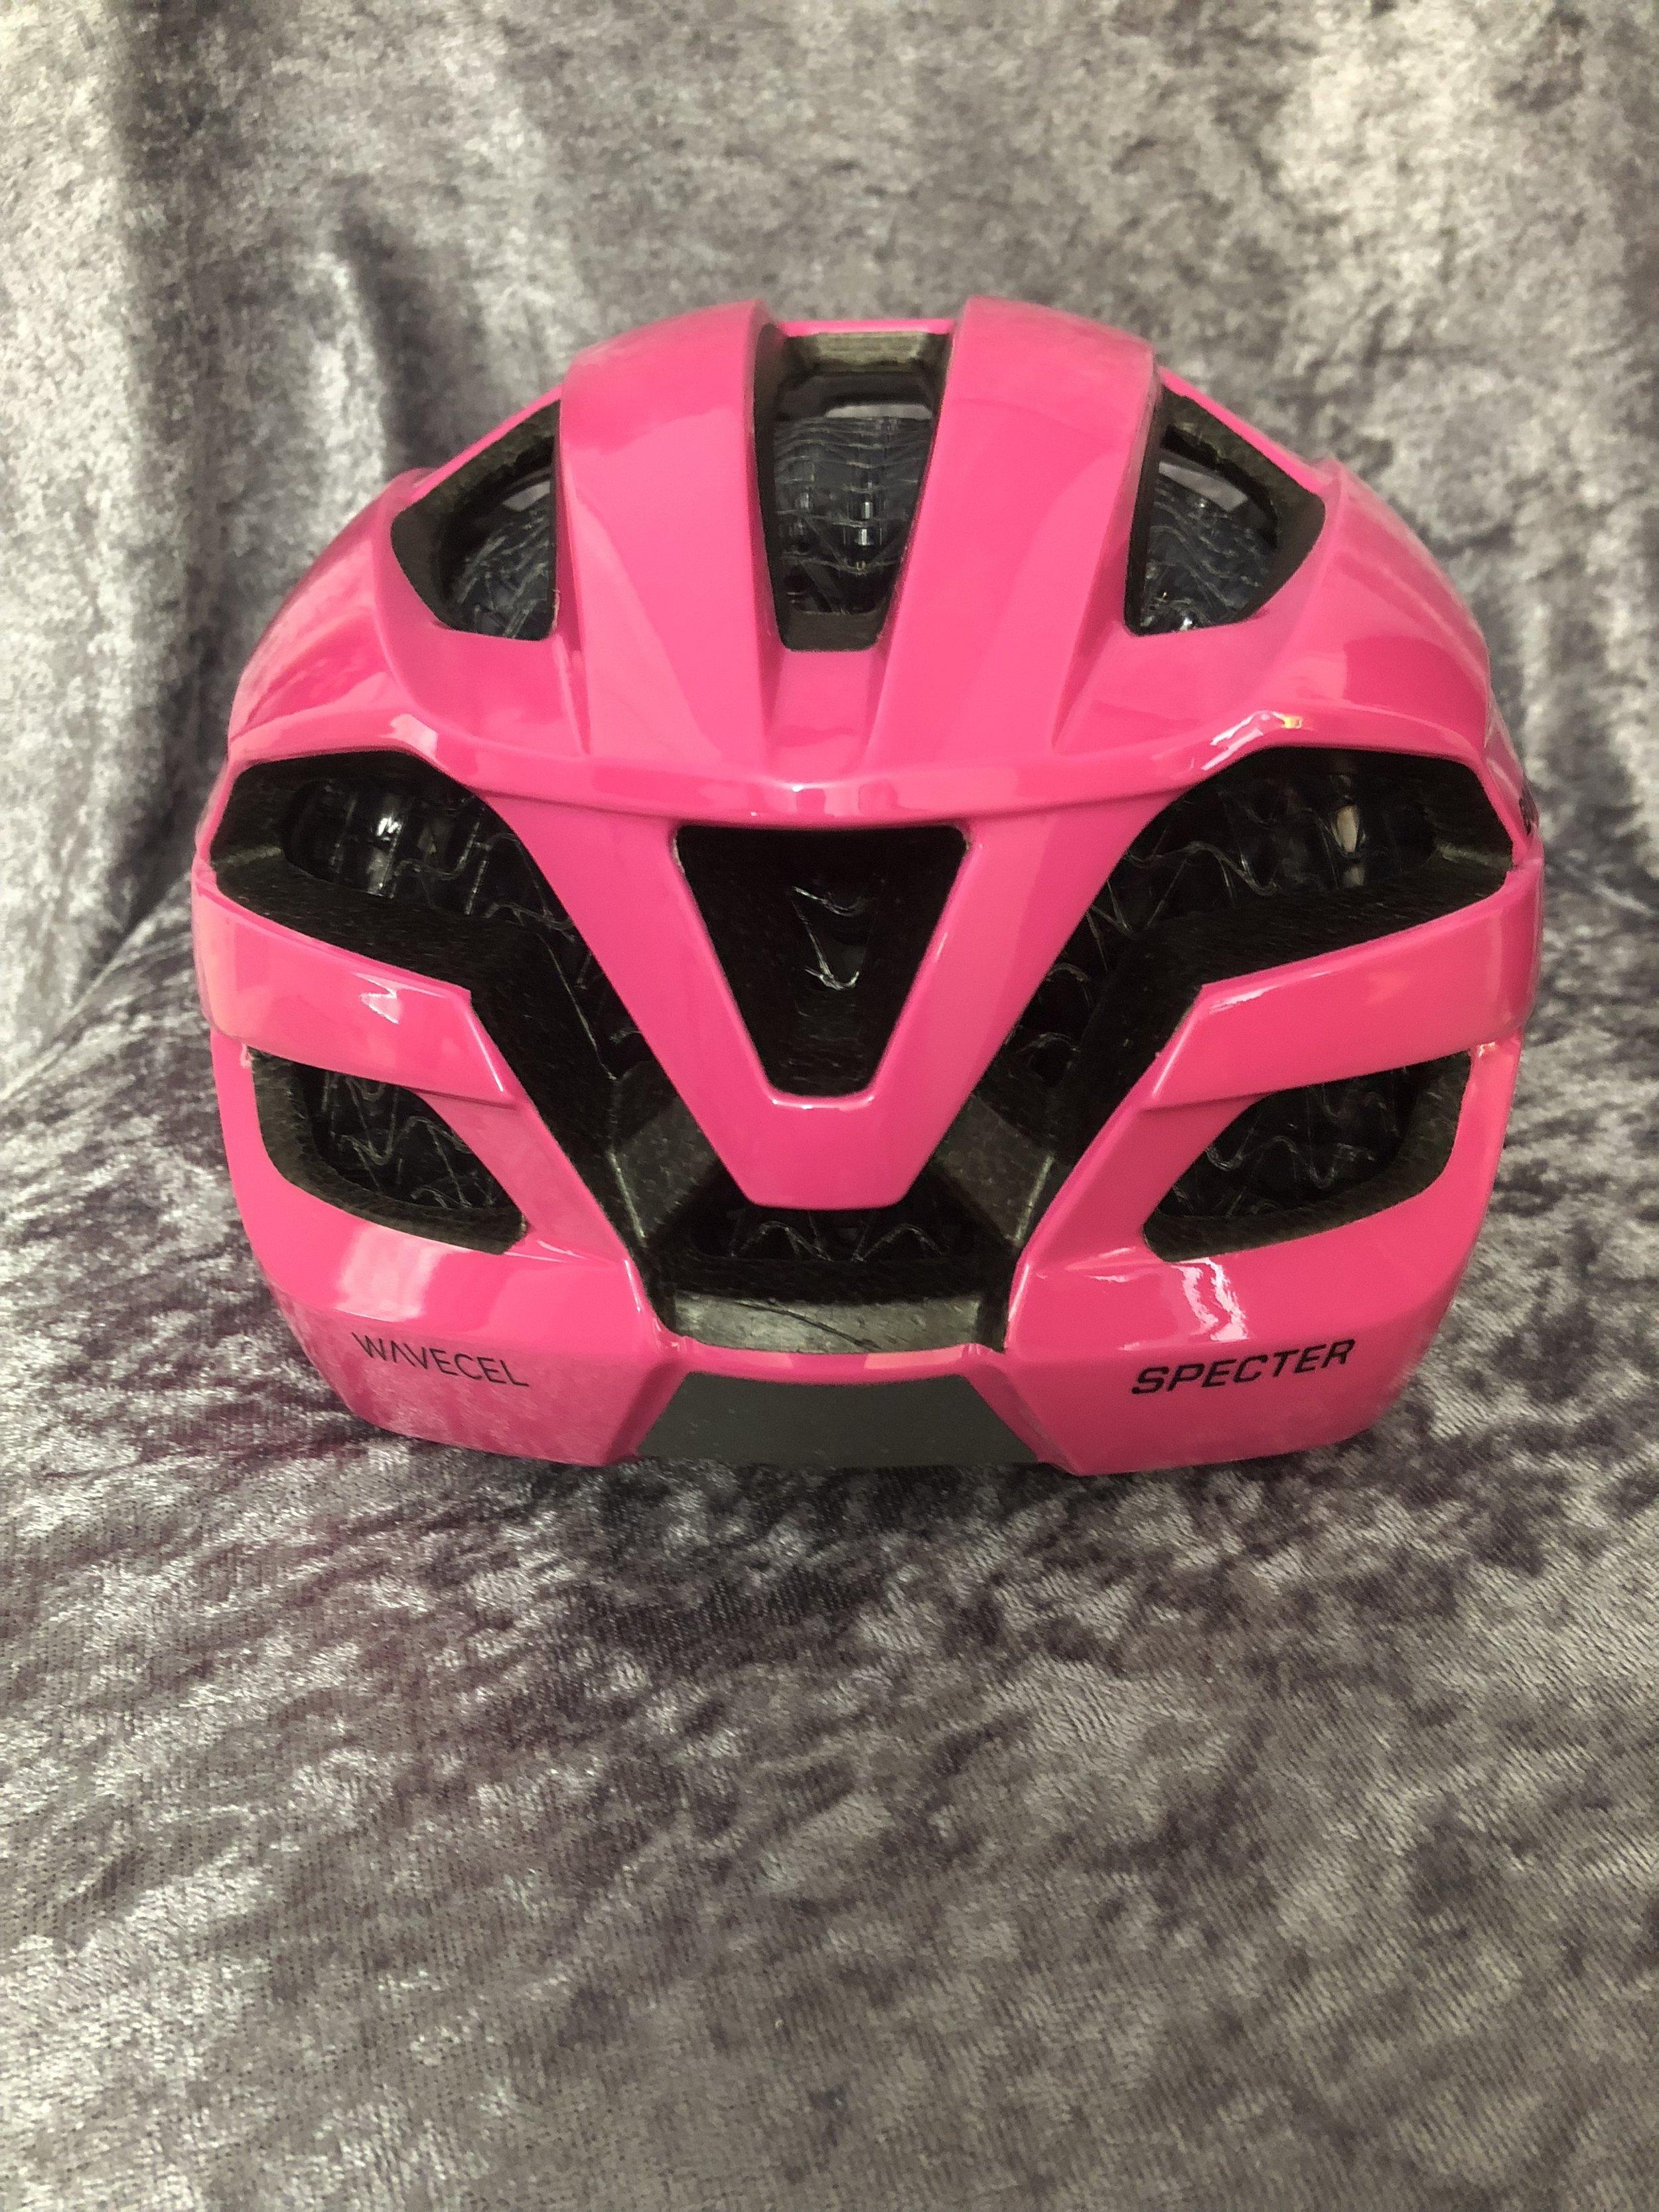 Bontrager Specter Helmet Pink Rear View